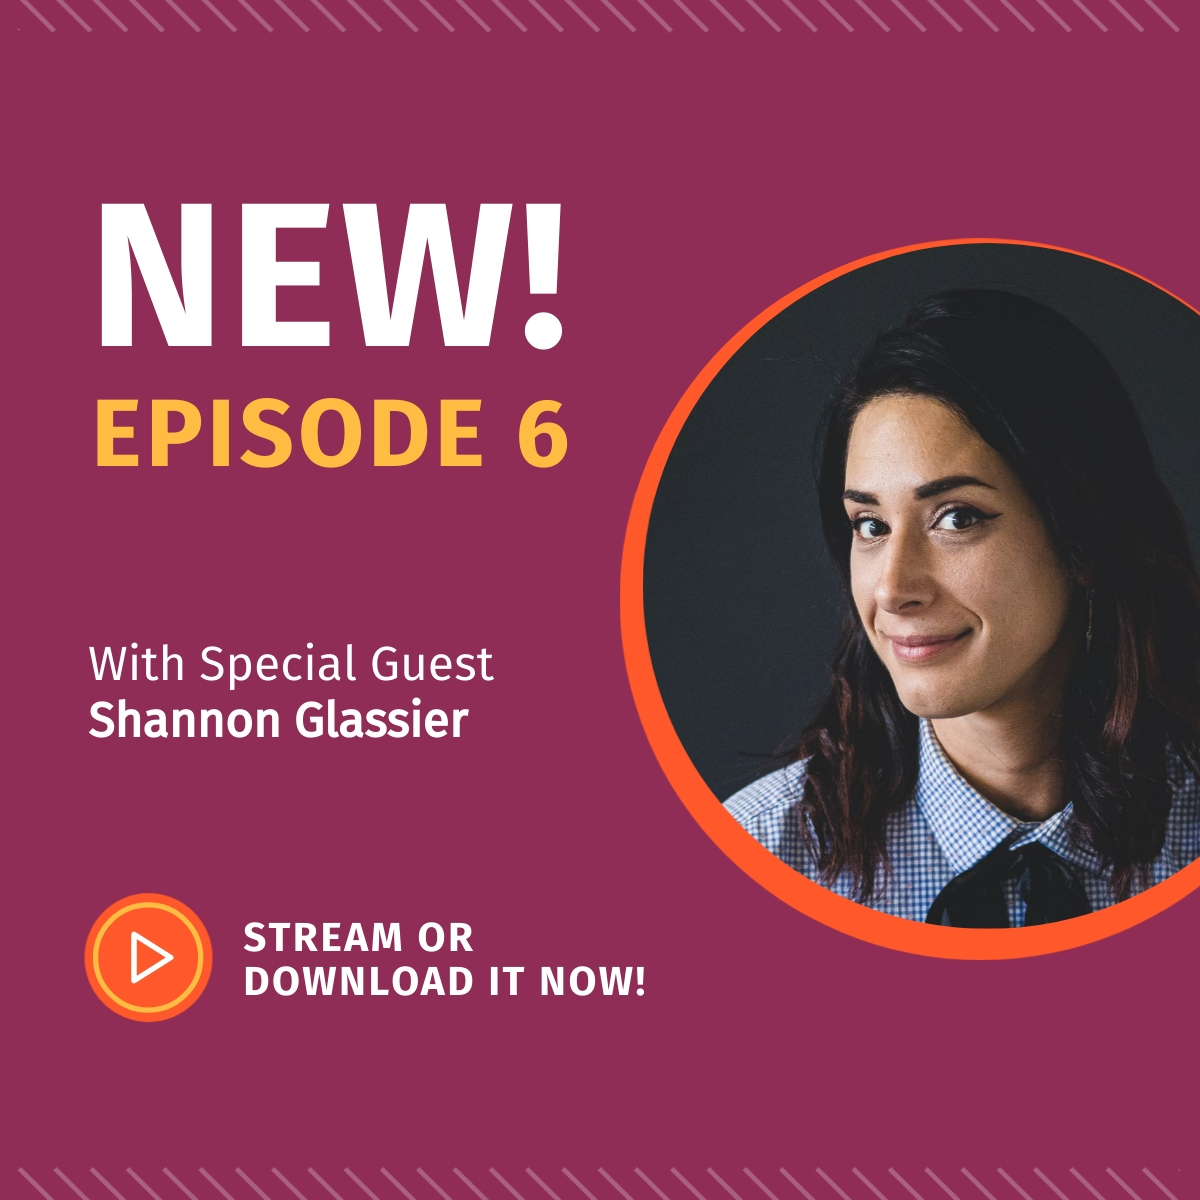 New Podcast Episode - LinkedIn Post Template